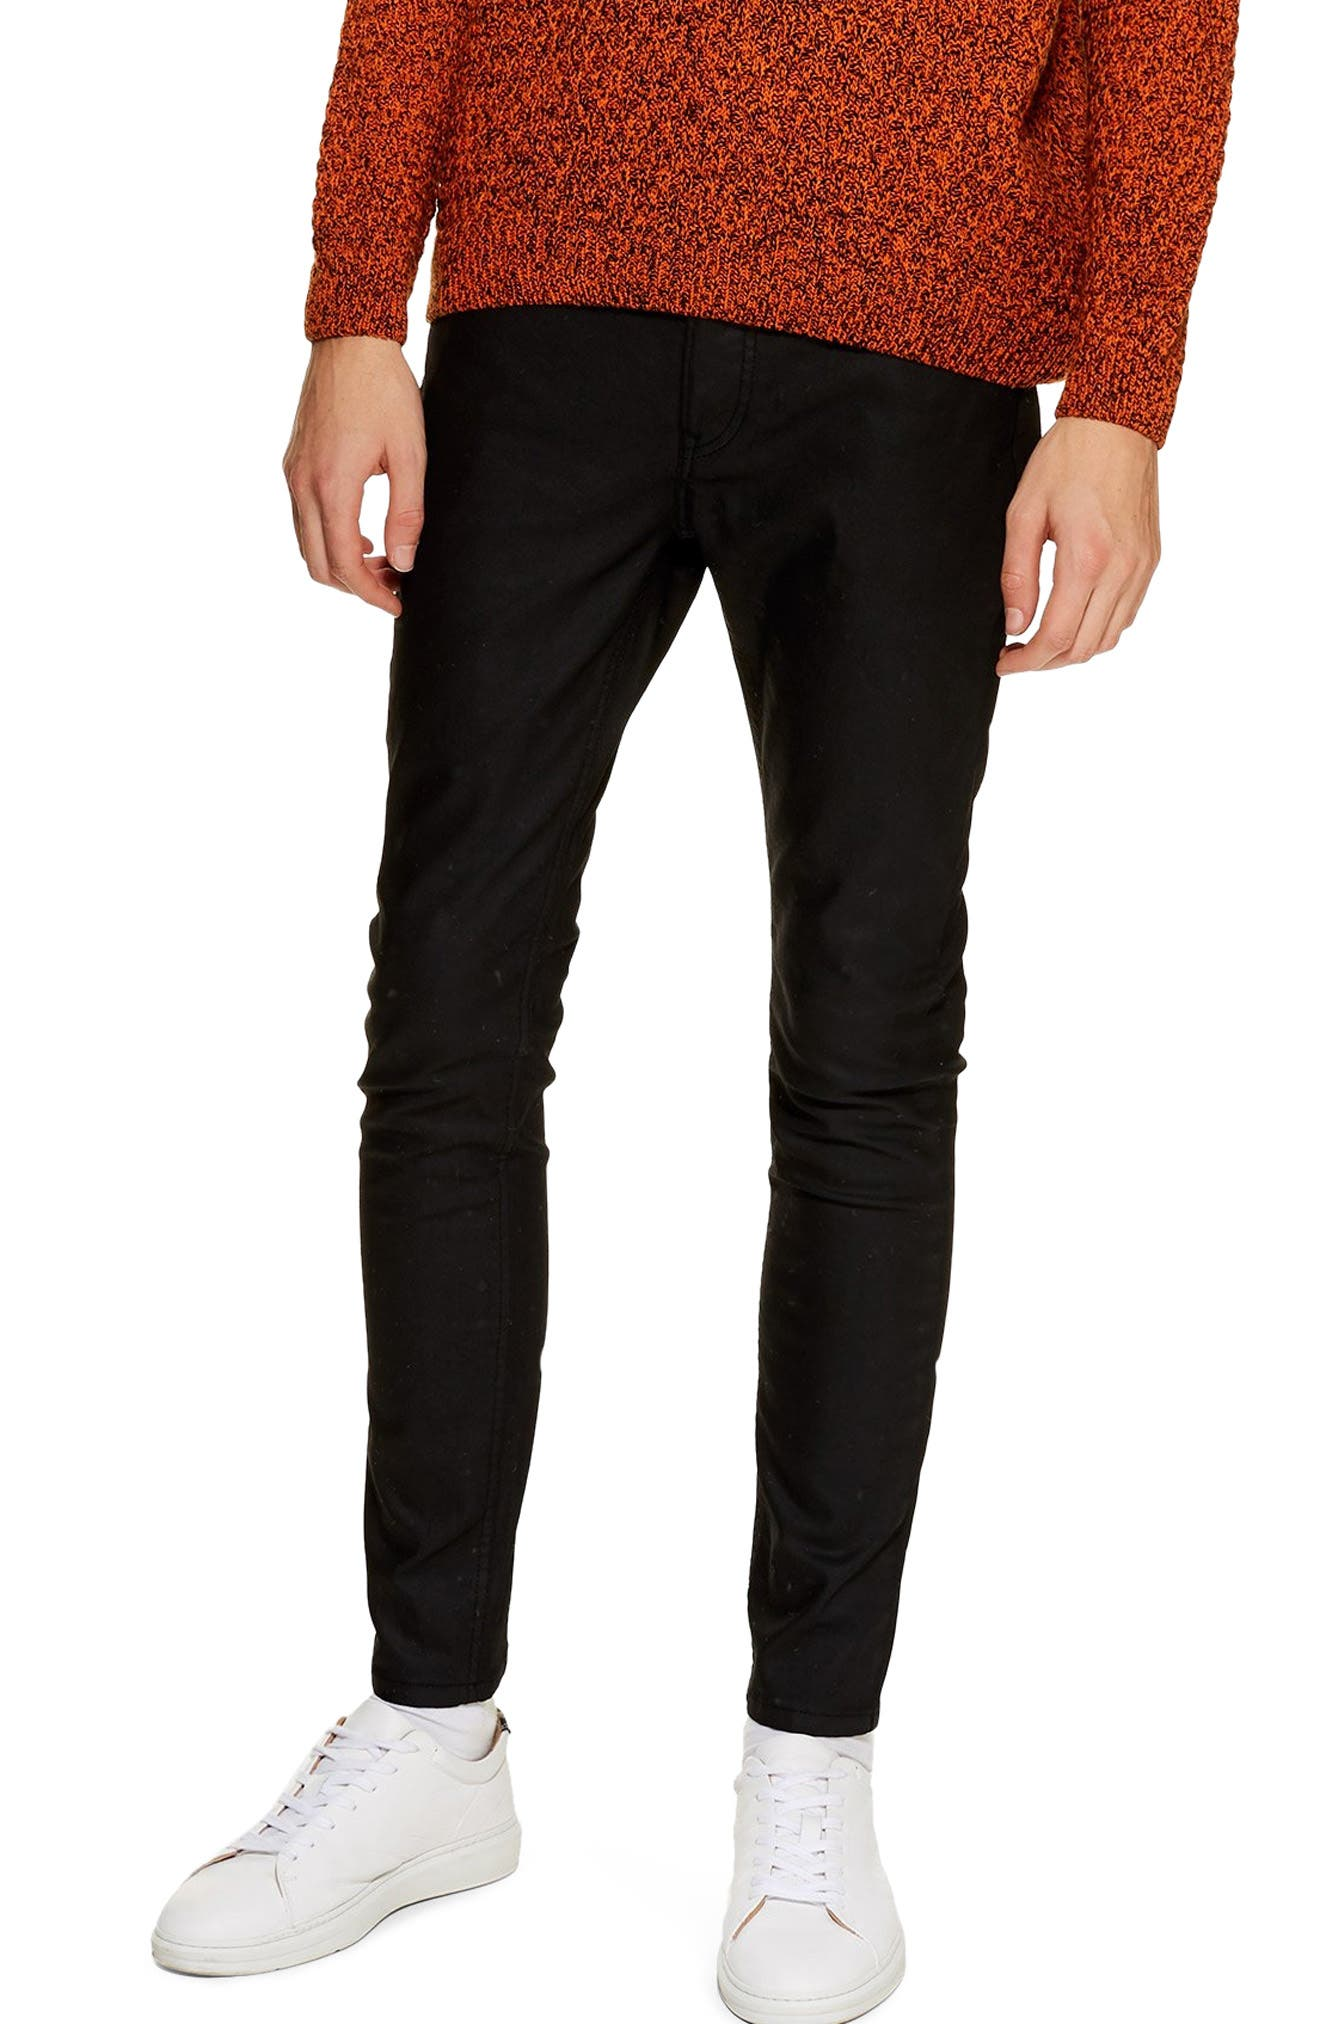 TOPMAN Coated Denim Skinny Jeans, Main, color, BLACK